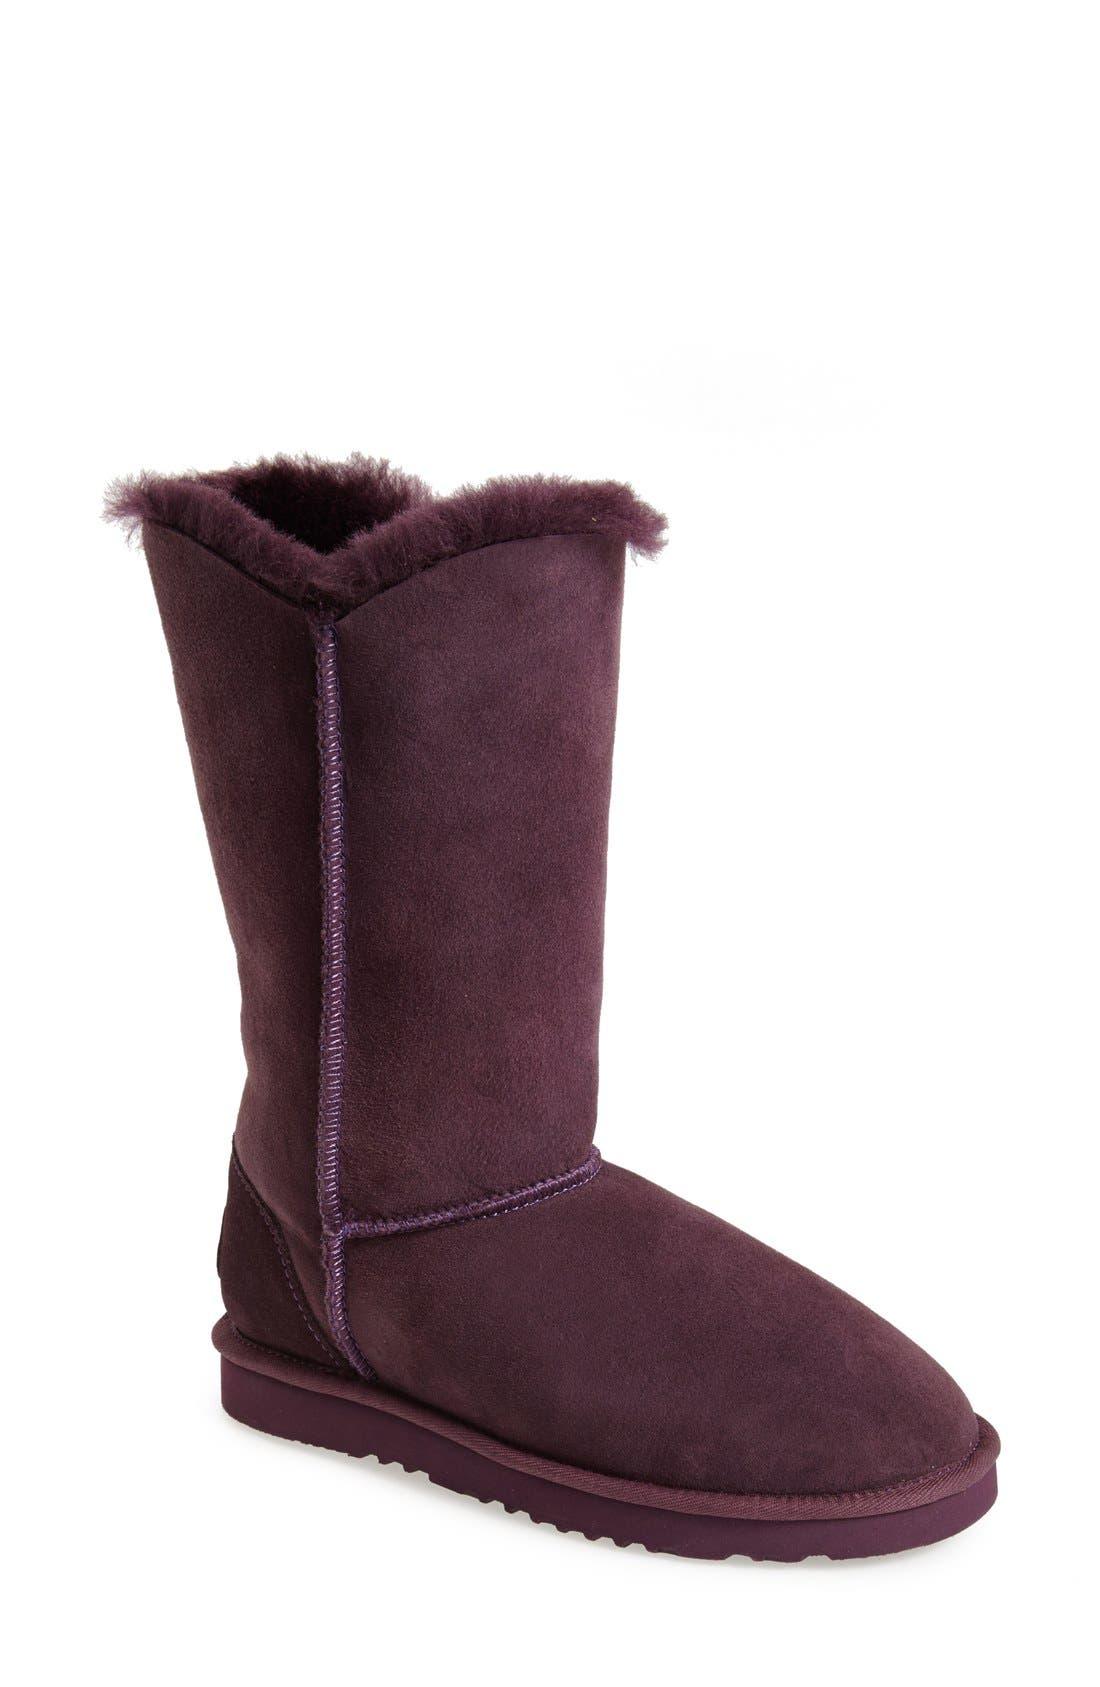 Alternate Image 1 Selected - Koolaburra 'Double Halo' Genuine Shearling Boot (Women)